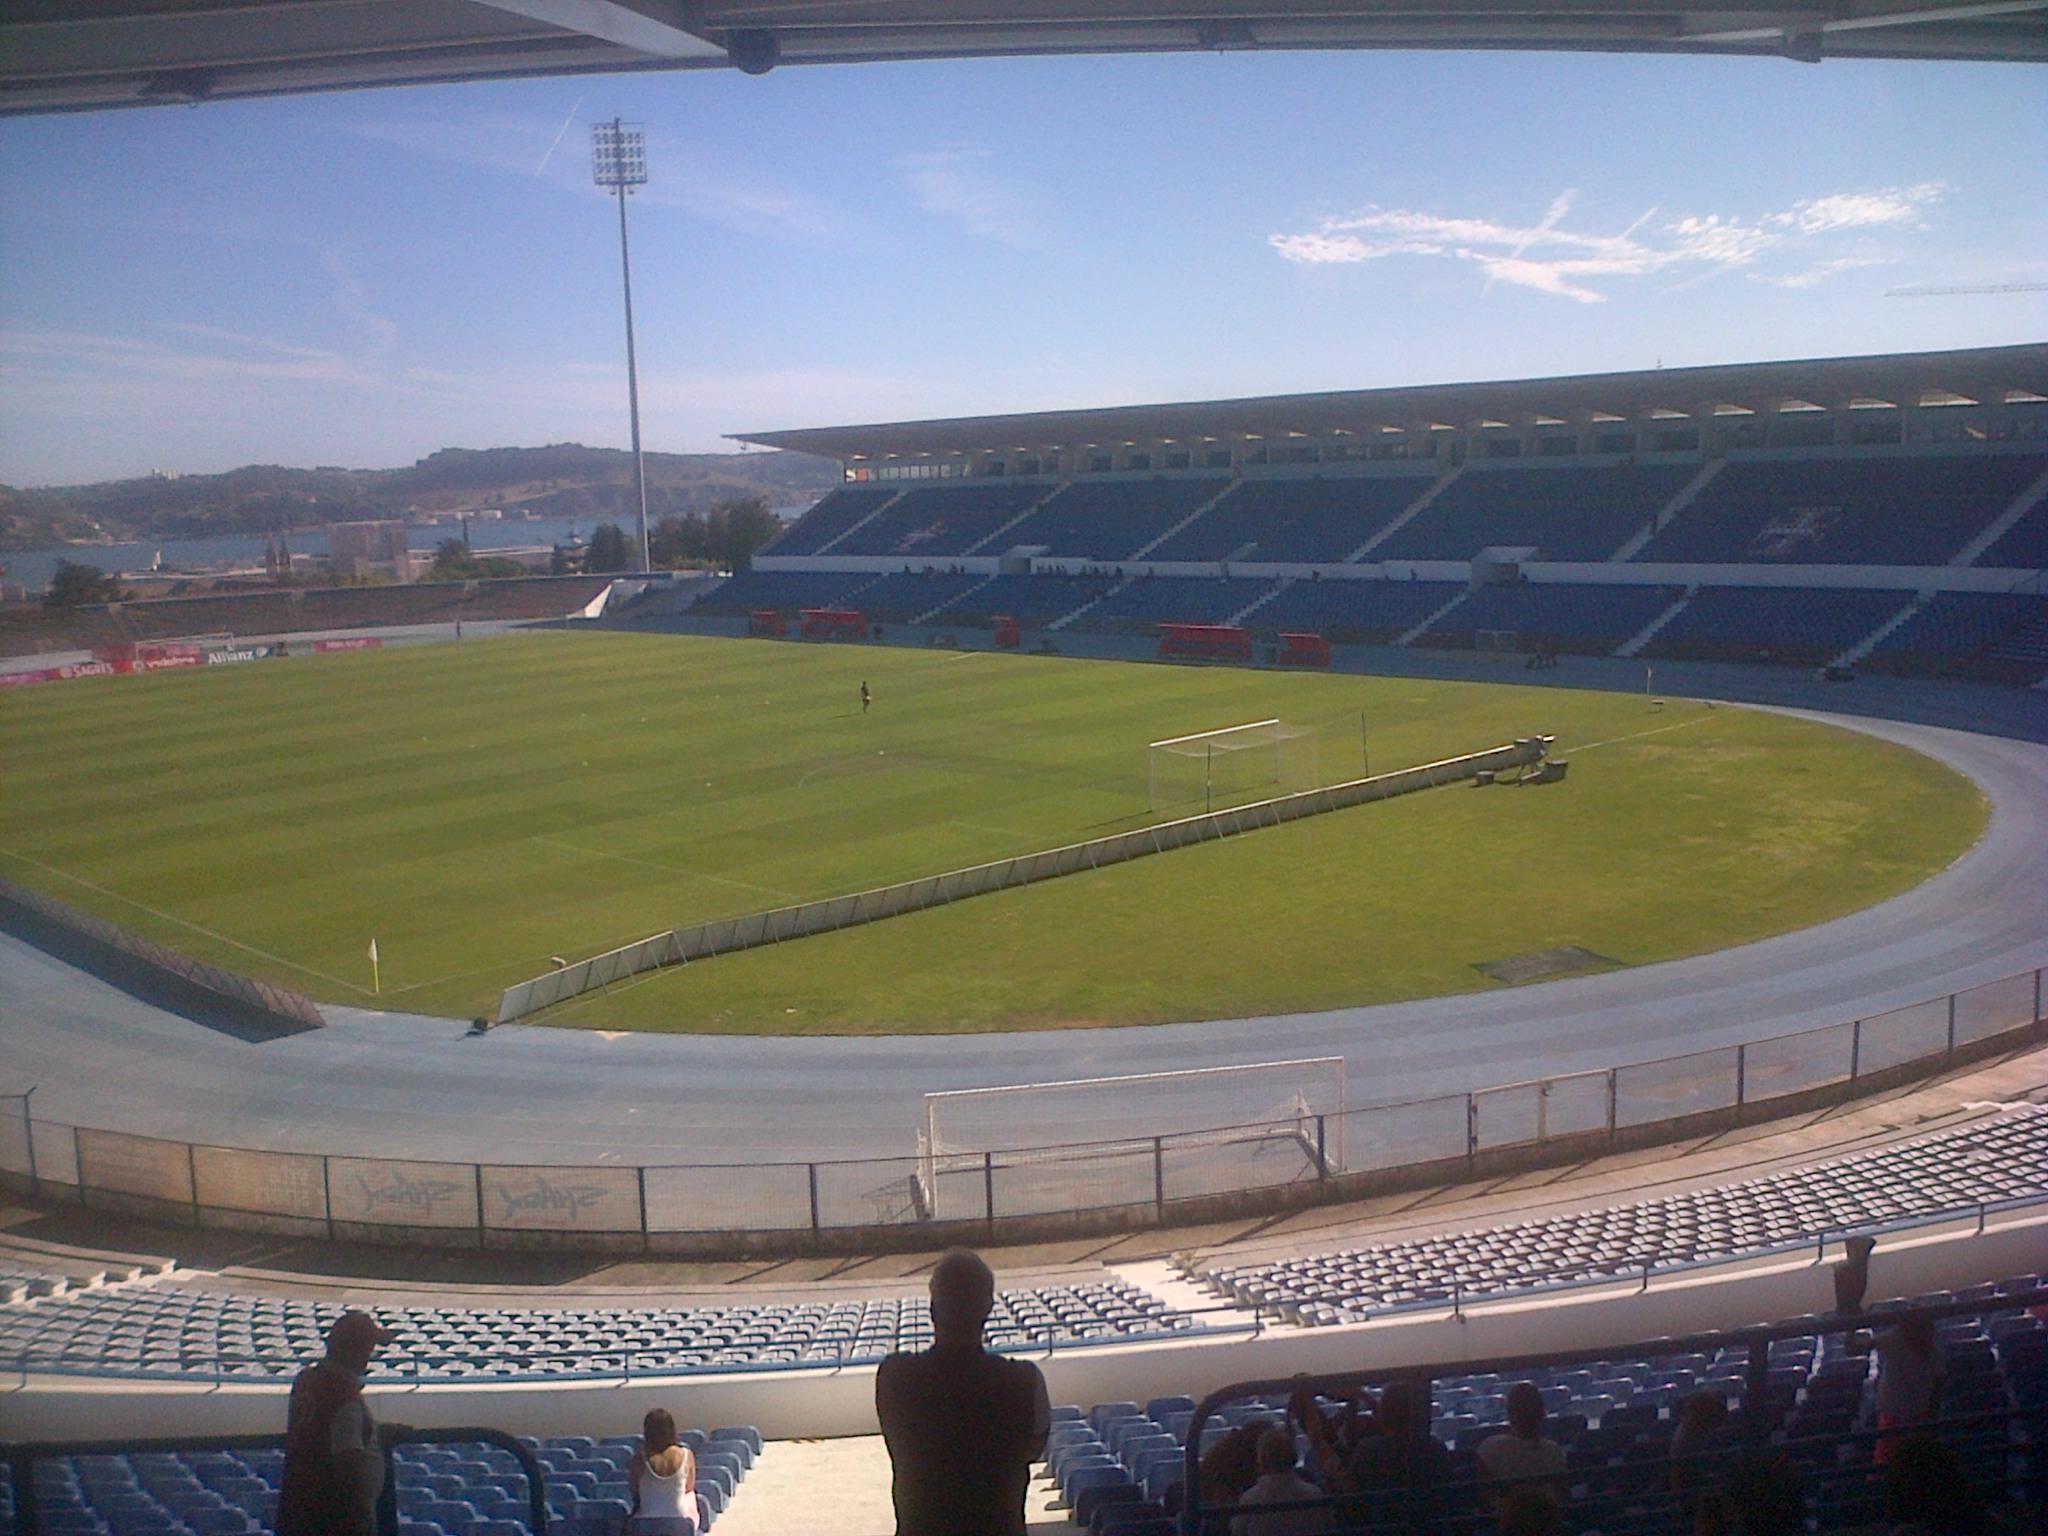 Belenenses – Vitória Guimarães (1)